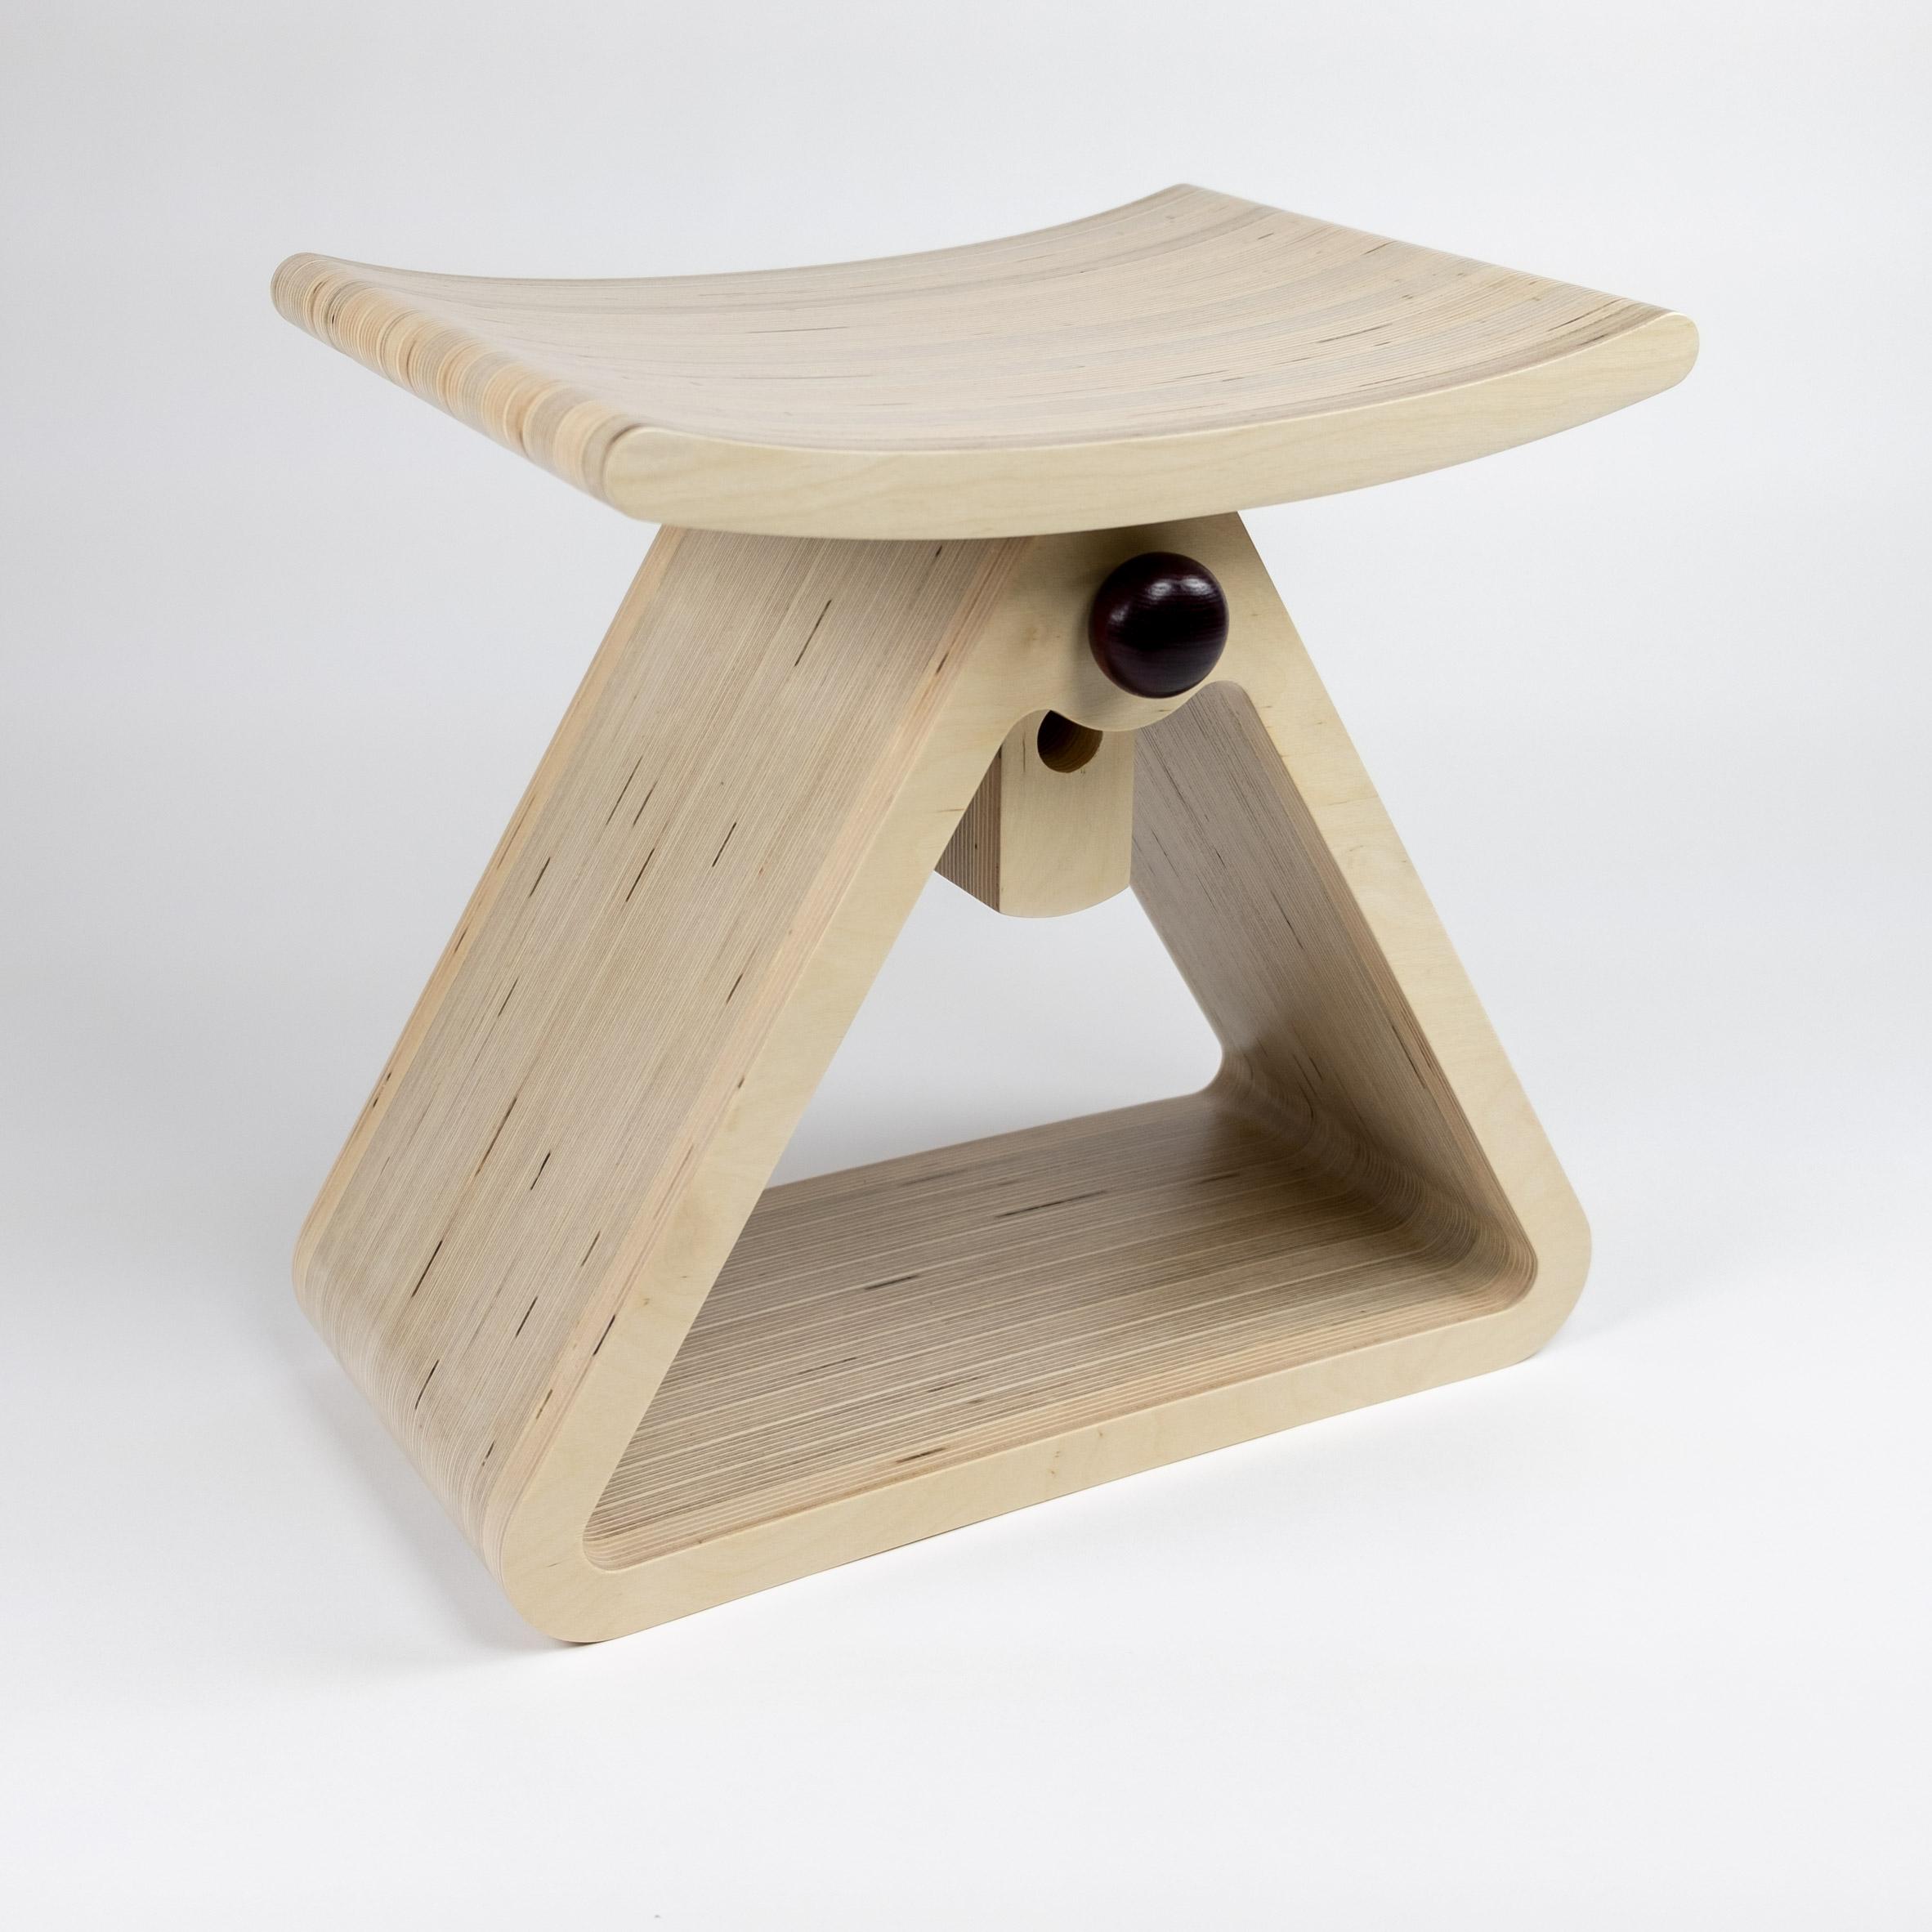 Africa by Design: Boraatii stool by Jomo Furniture